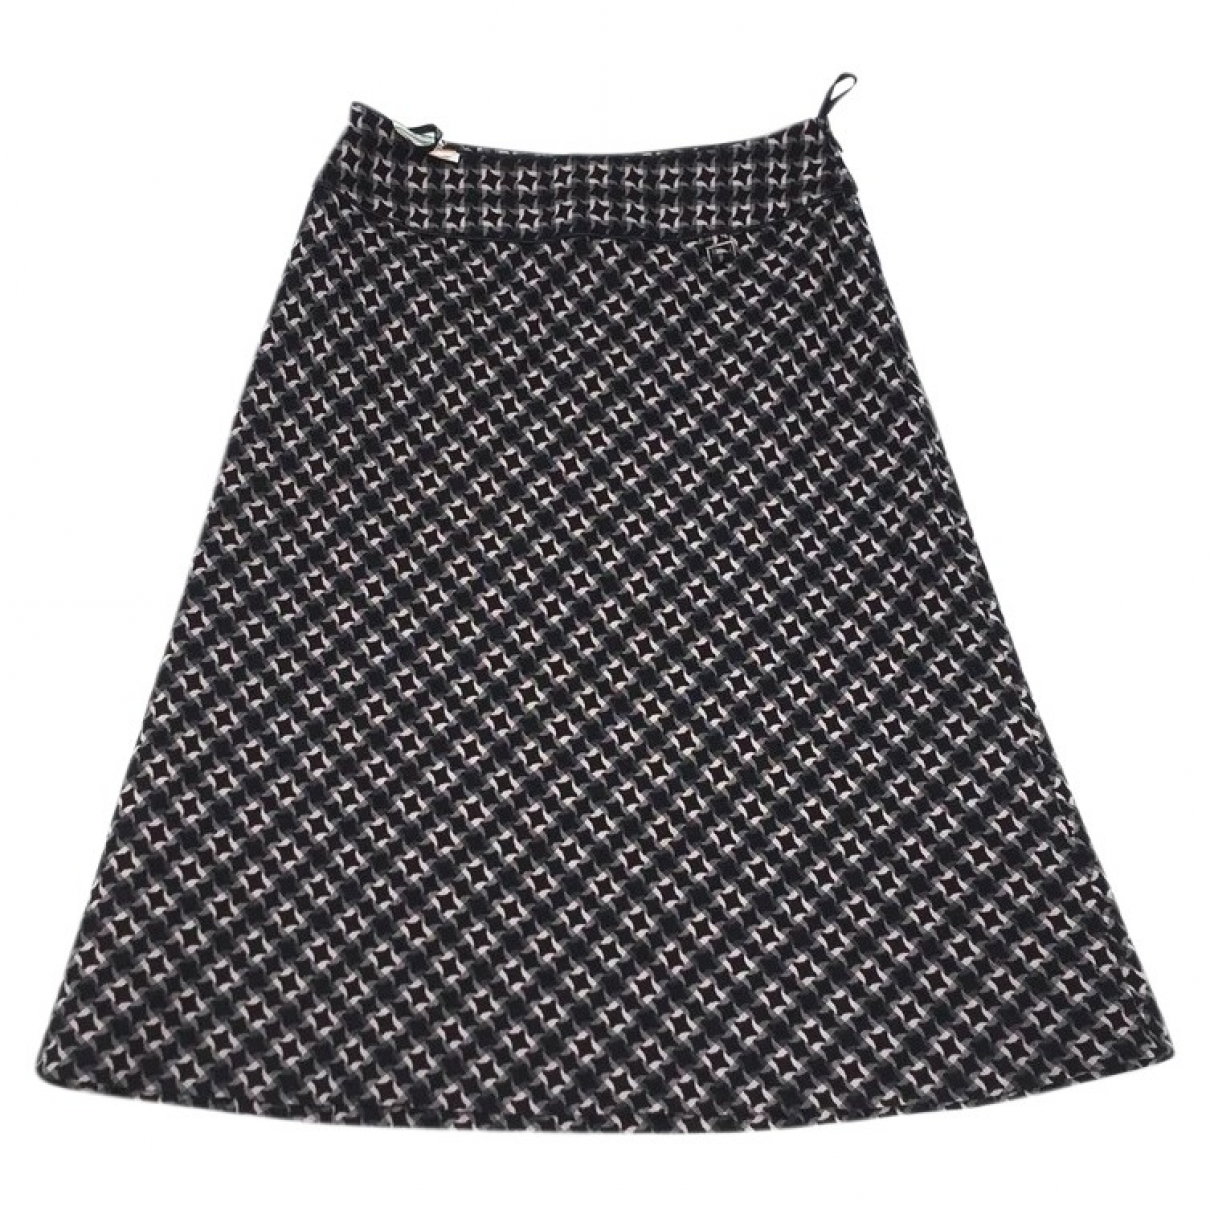 Sonia By Sonia Rykiel \N Cotton - elasthane skirt for Women 40 FR